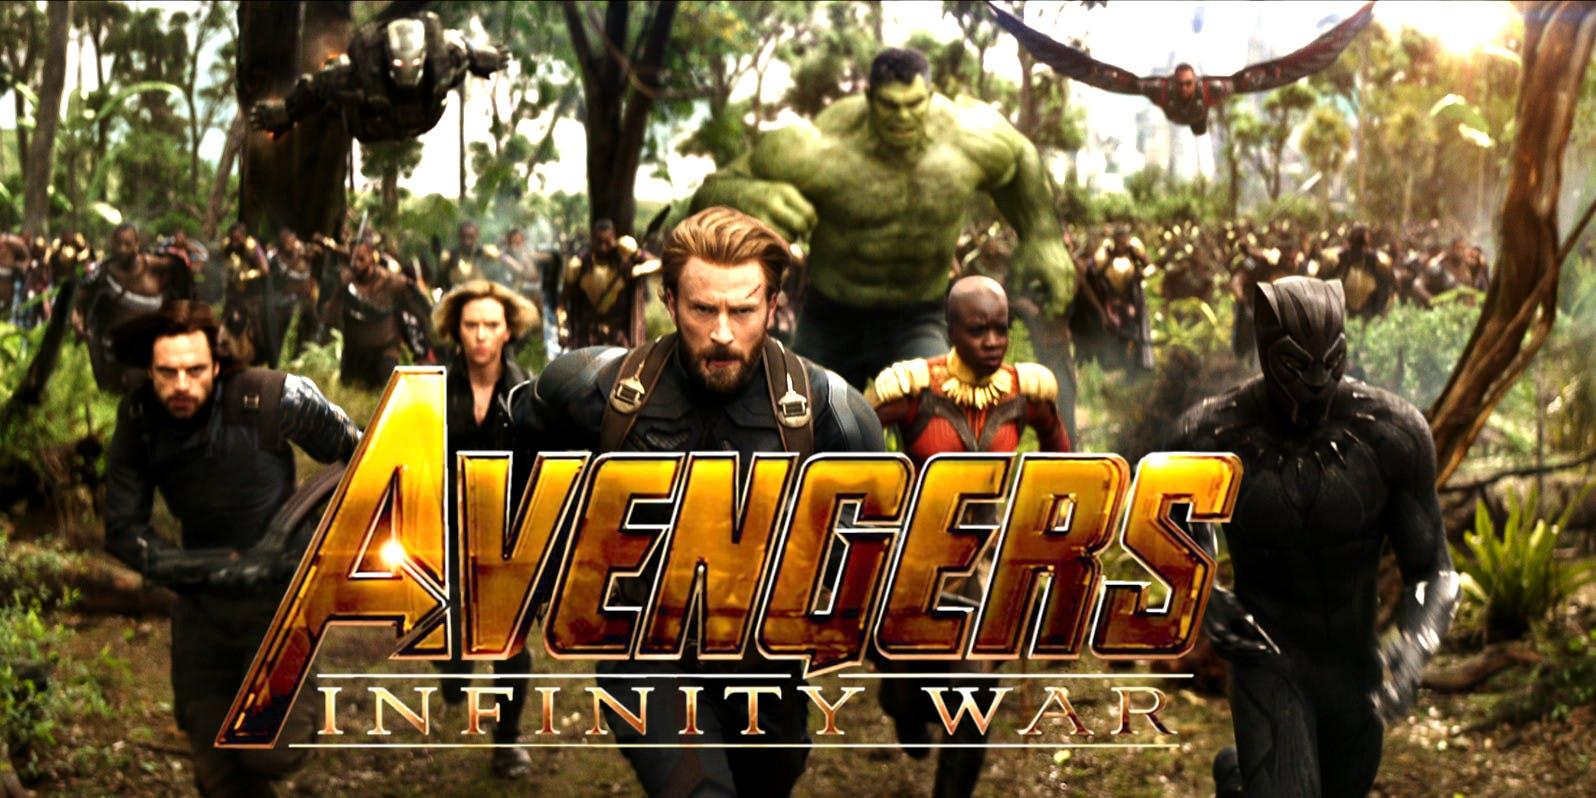 Wow Movies Hd Avengers Infinity War Full Movie 2018 Watch